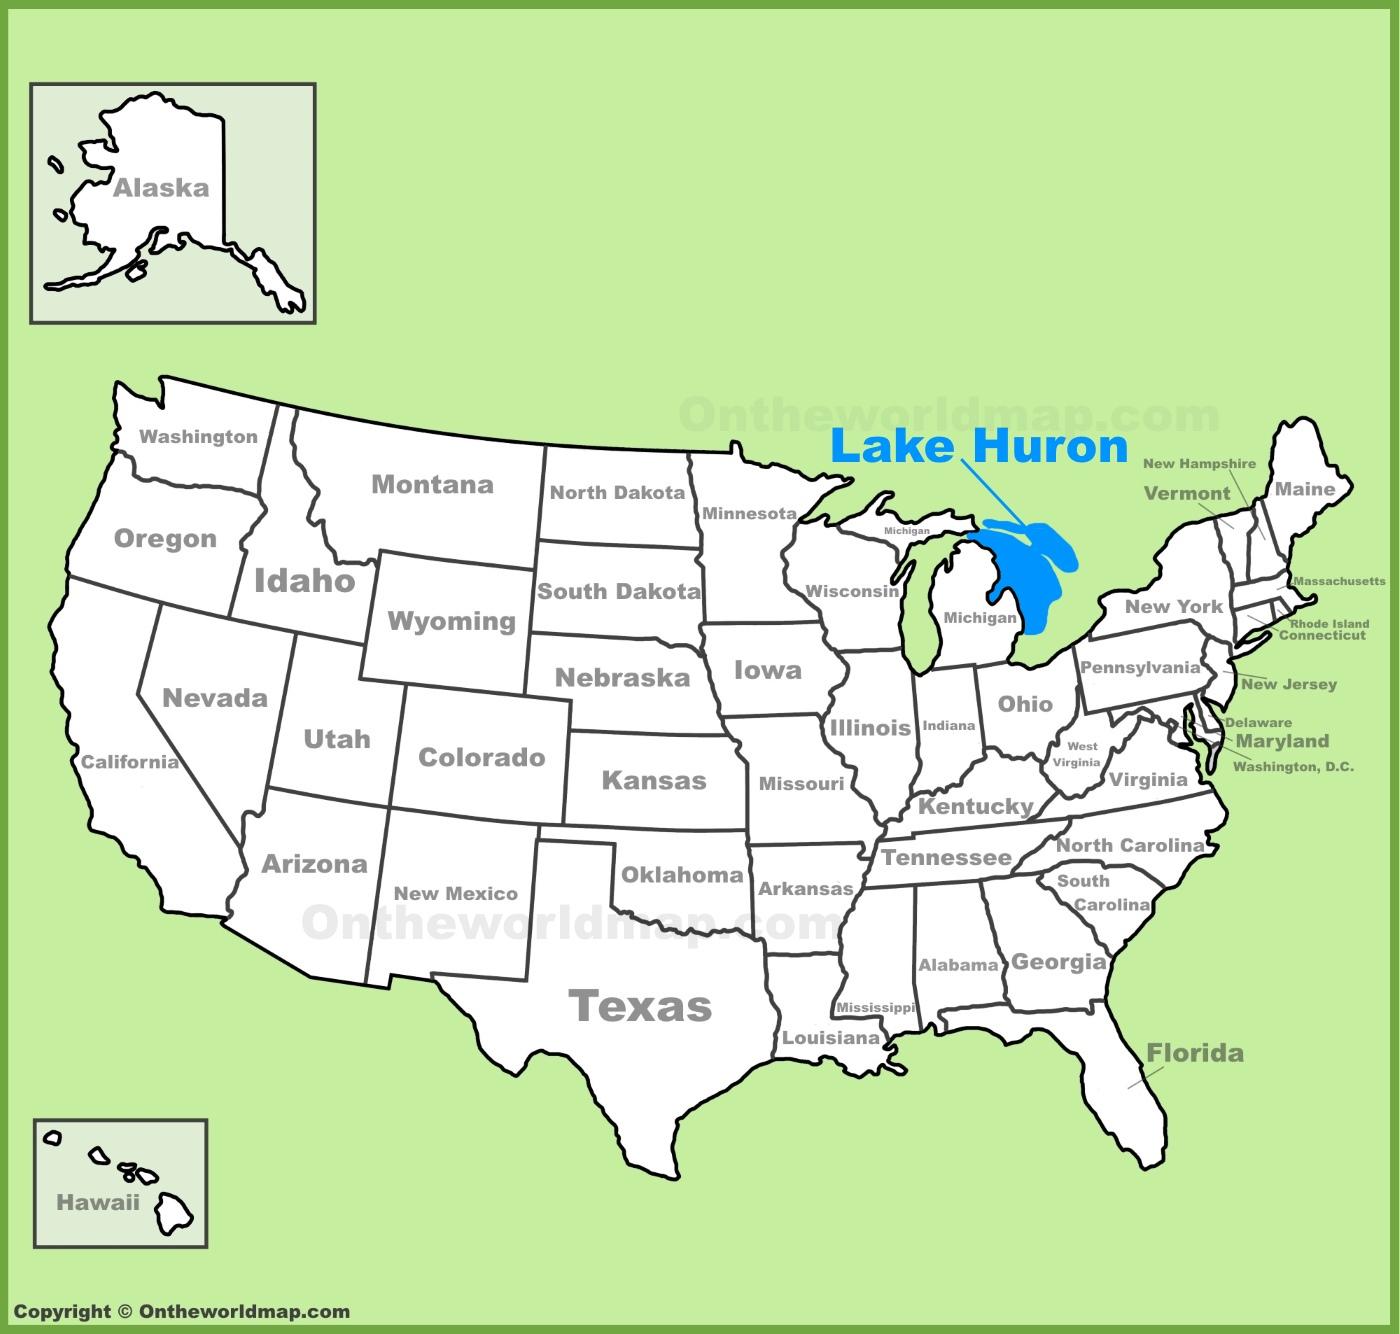 Lake Huron Location On The US Map - Lake huron on us map